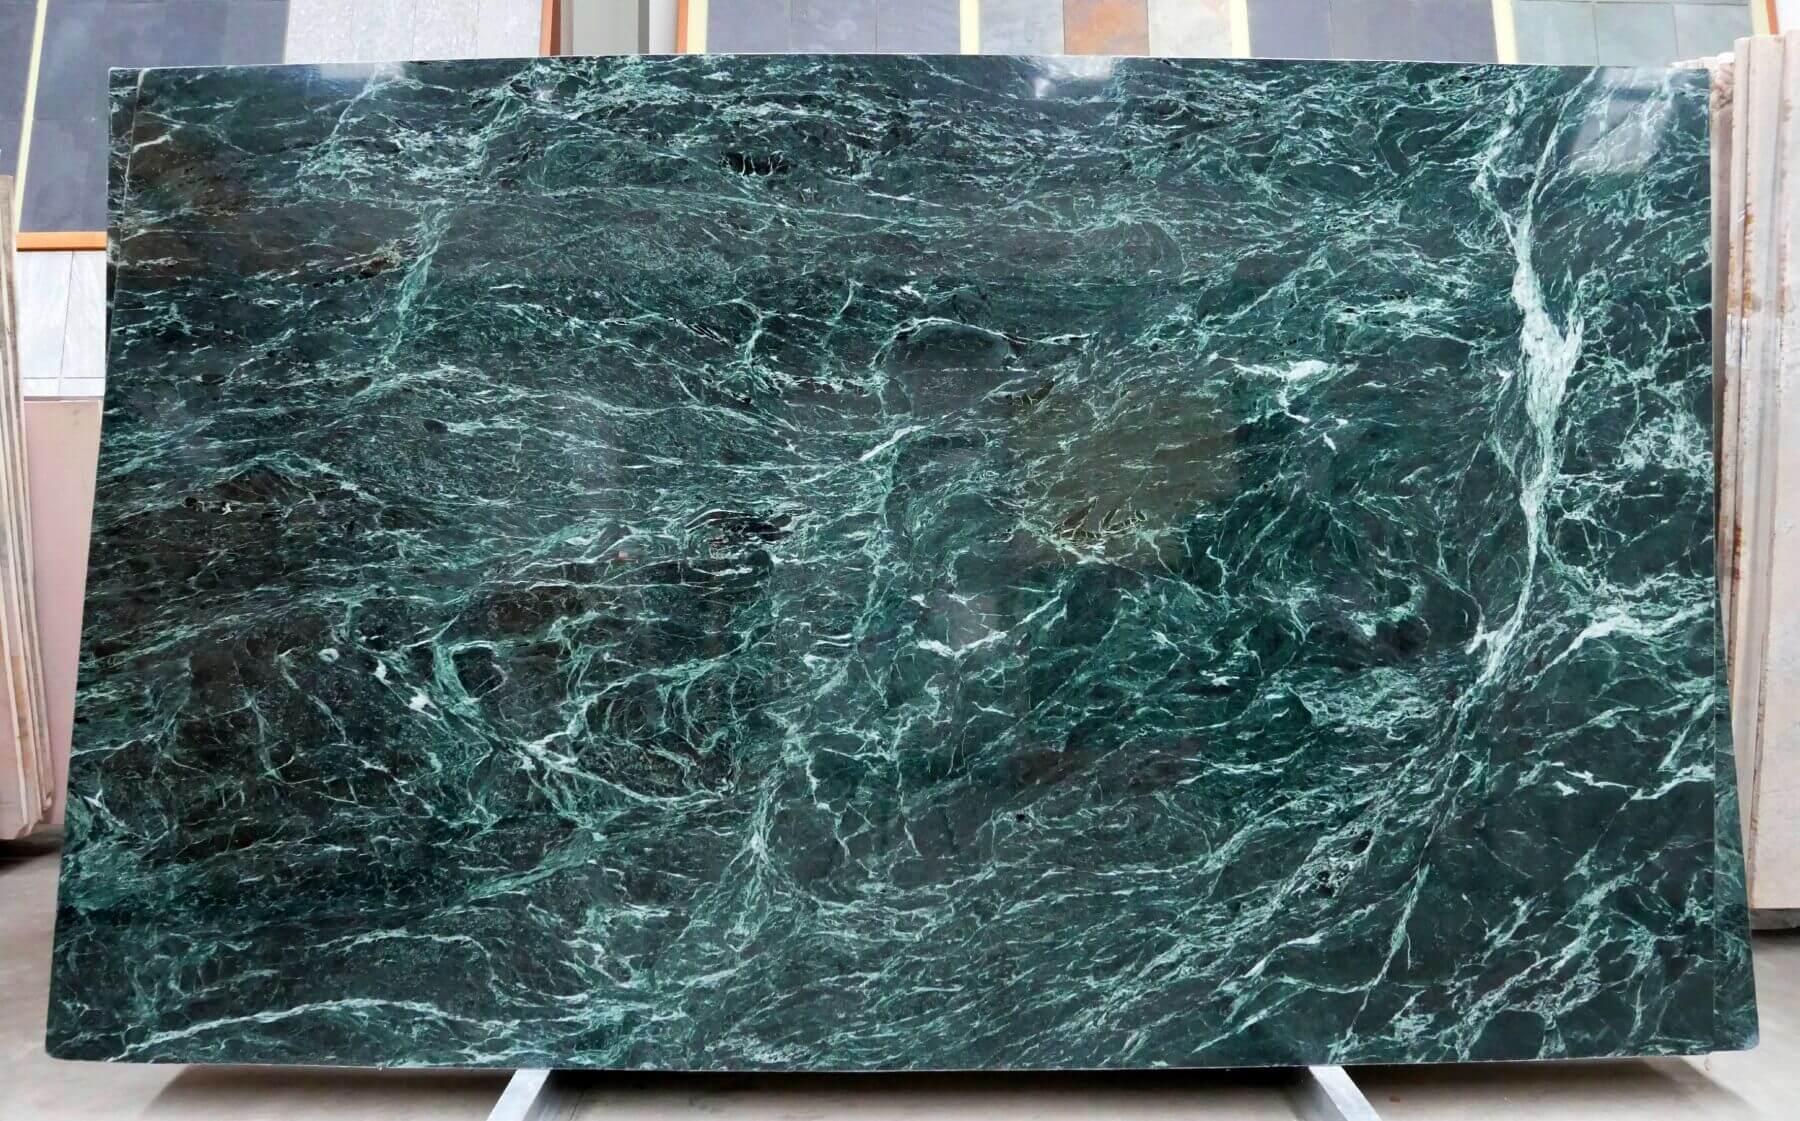 61795 271-284x171-173x2cm 76 polished sl